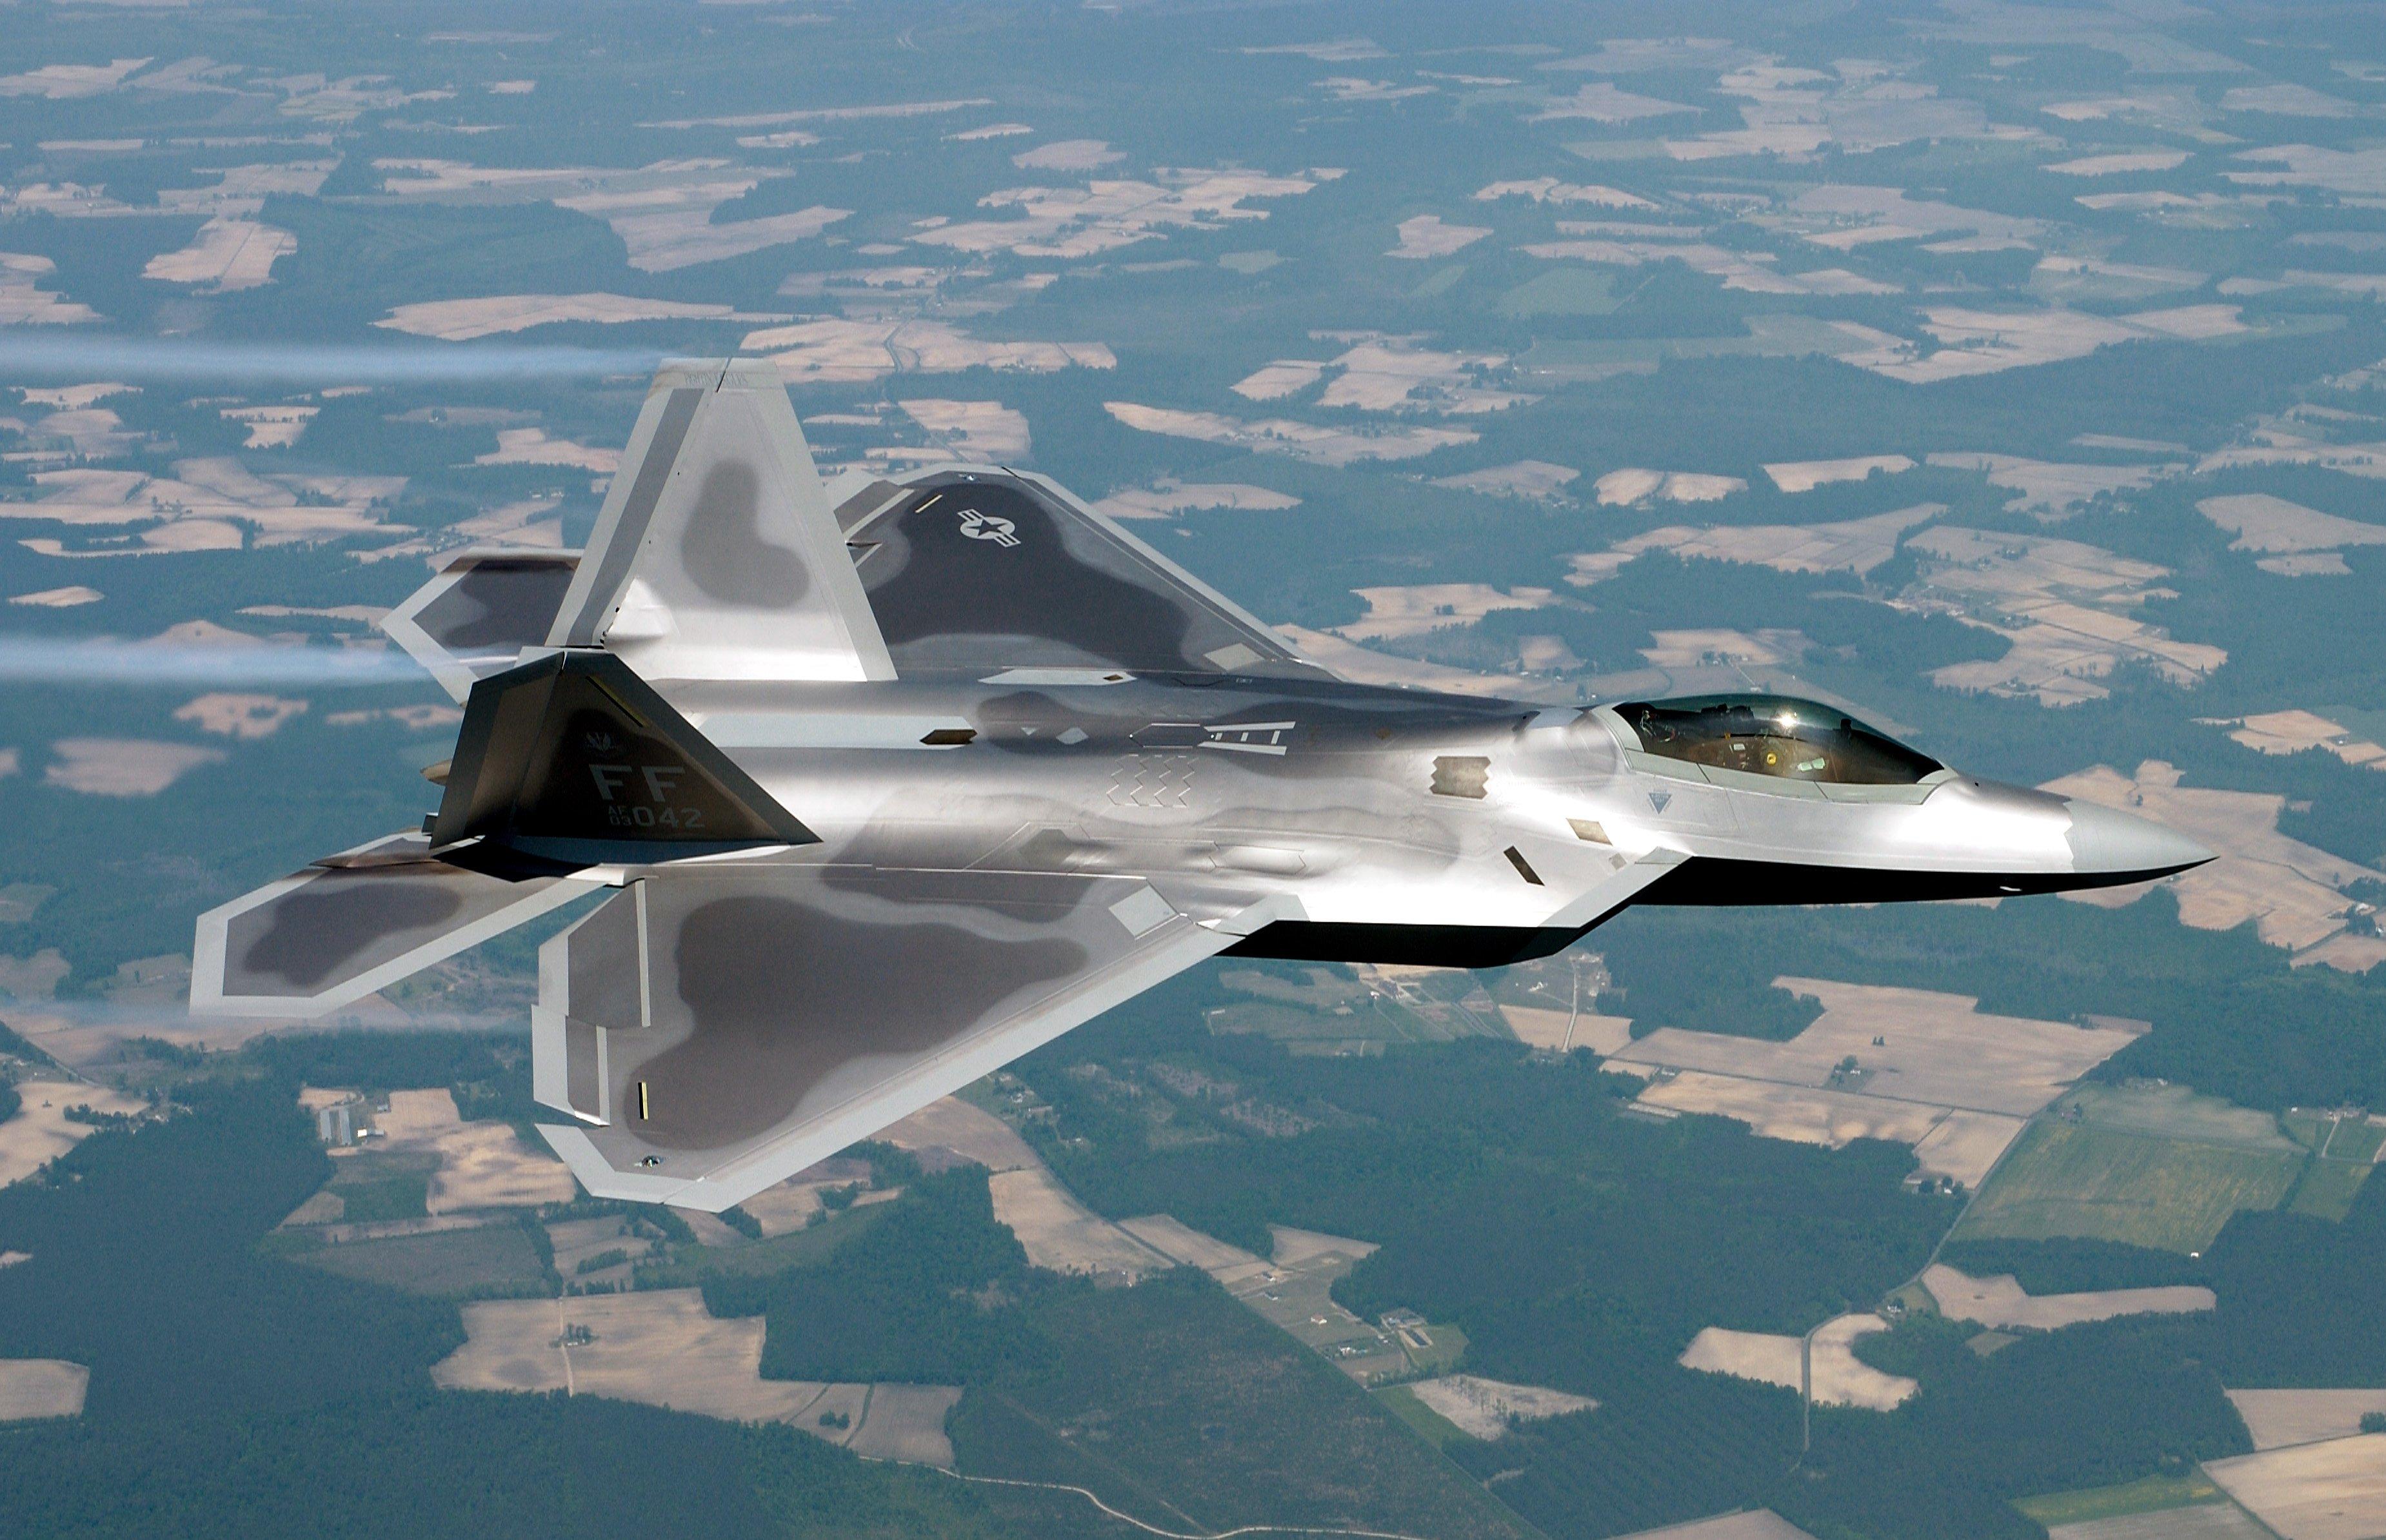 22 raptor aircraft military planes vehicles wallpaper HQ WALLPAPER 3699x2388